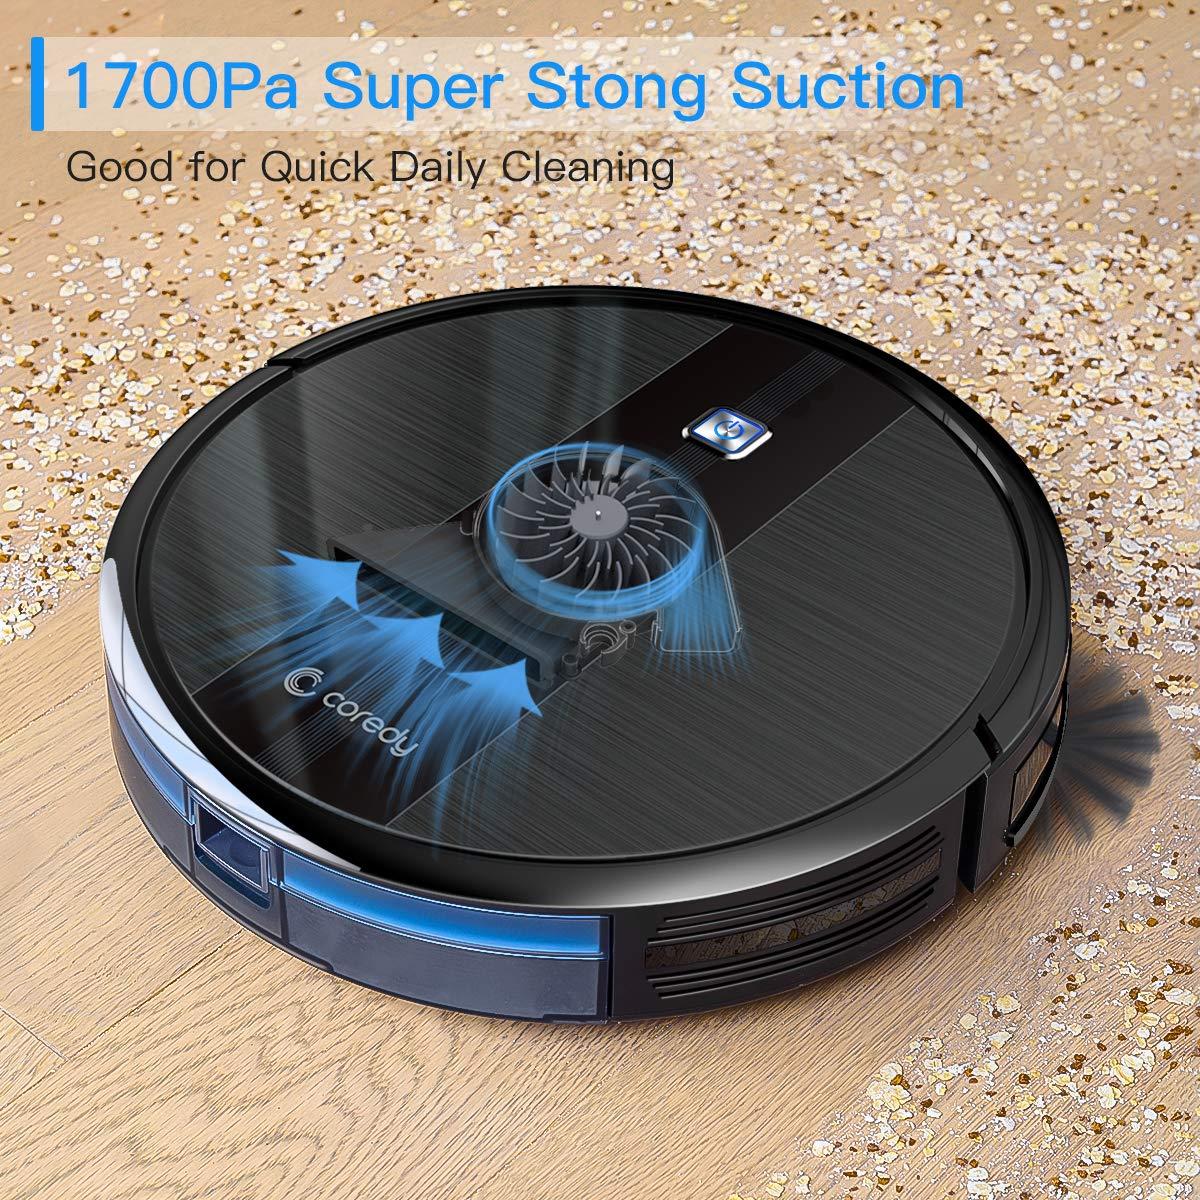 Coredy Robot Vacuum Cleaner1700P